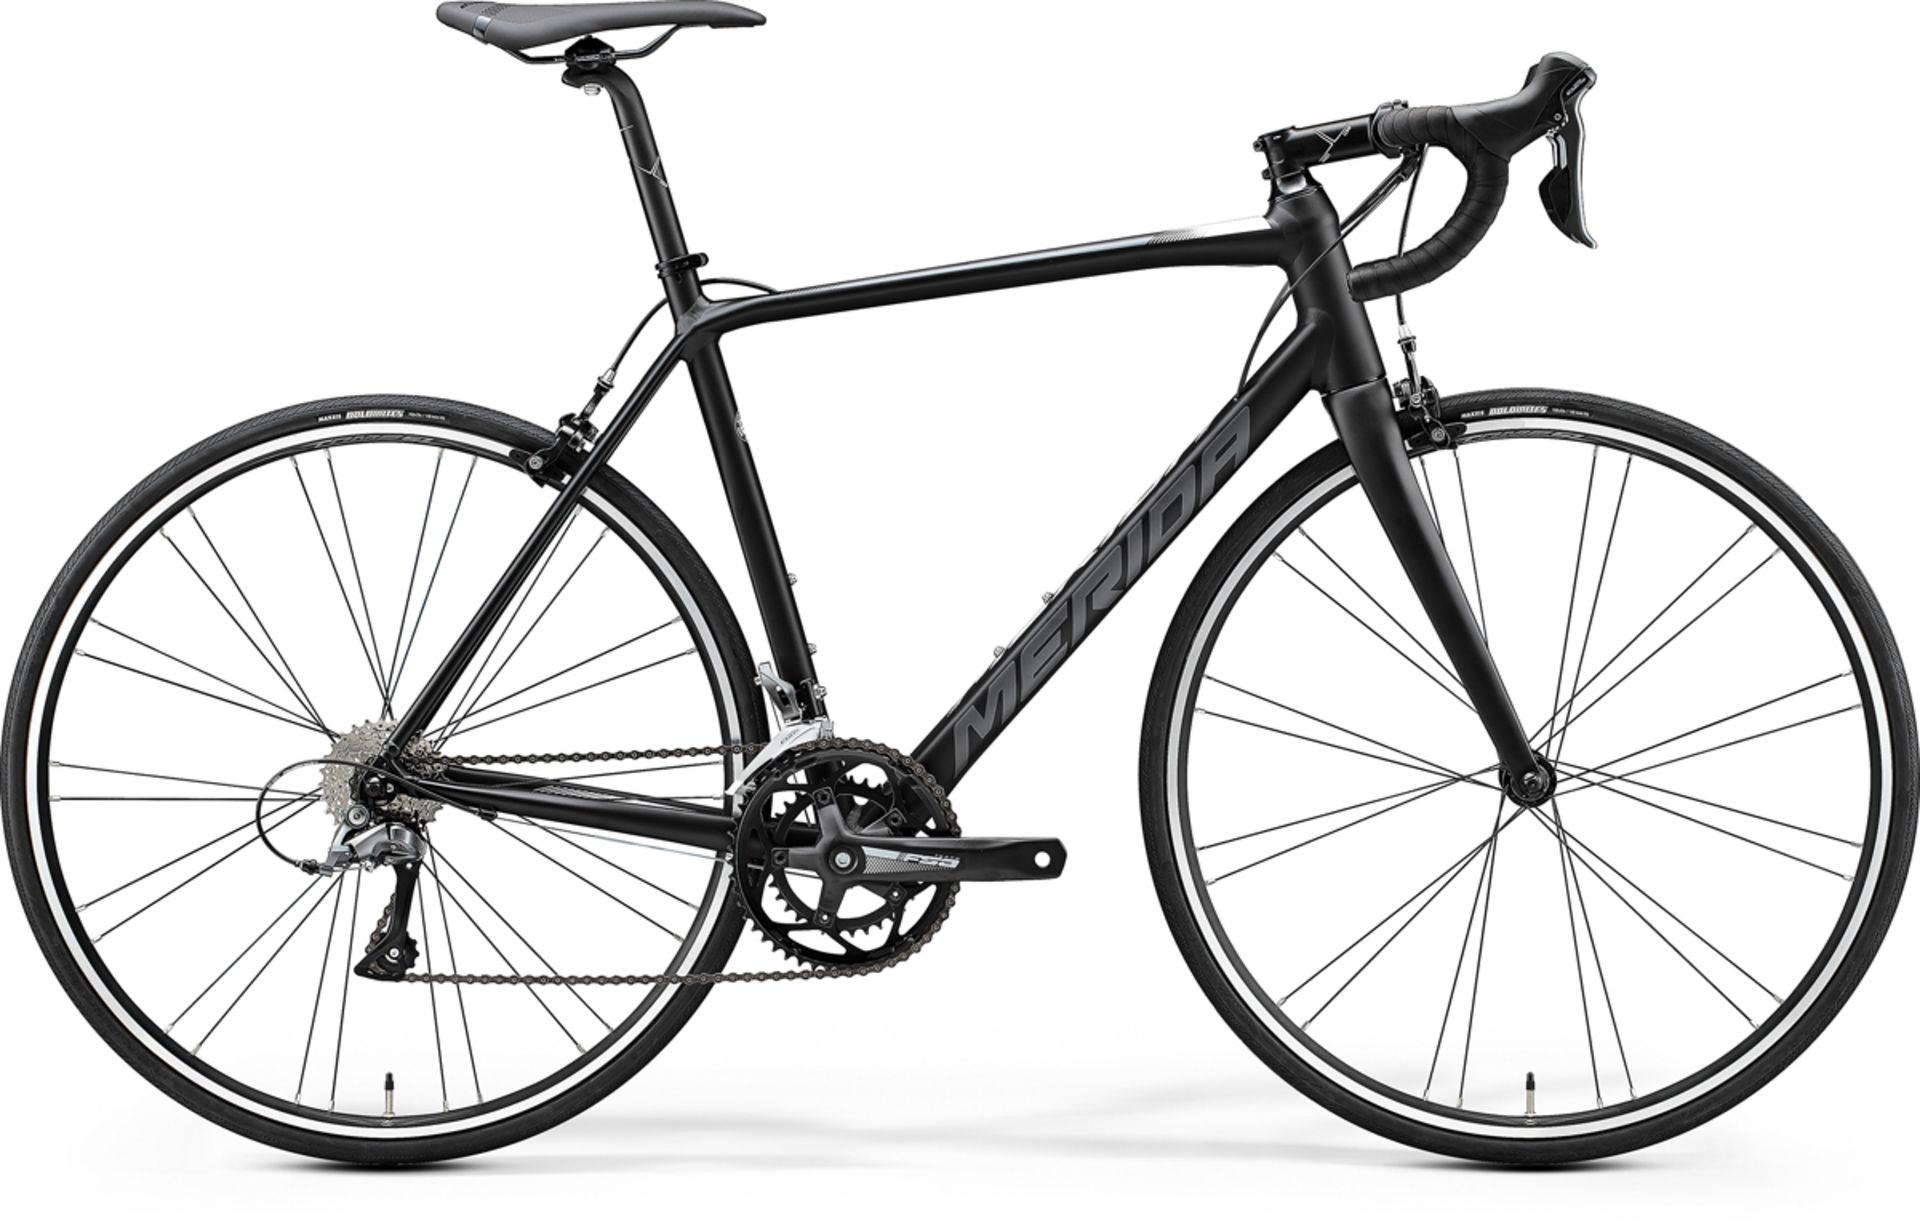 best road bike, entry level road bike, best looking road bike, bicycle, scultura, merida road bike, shimano, bike exchange, bike review